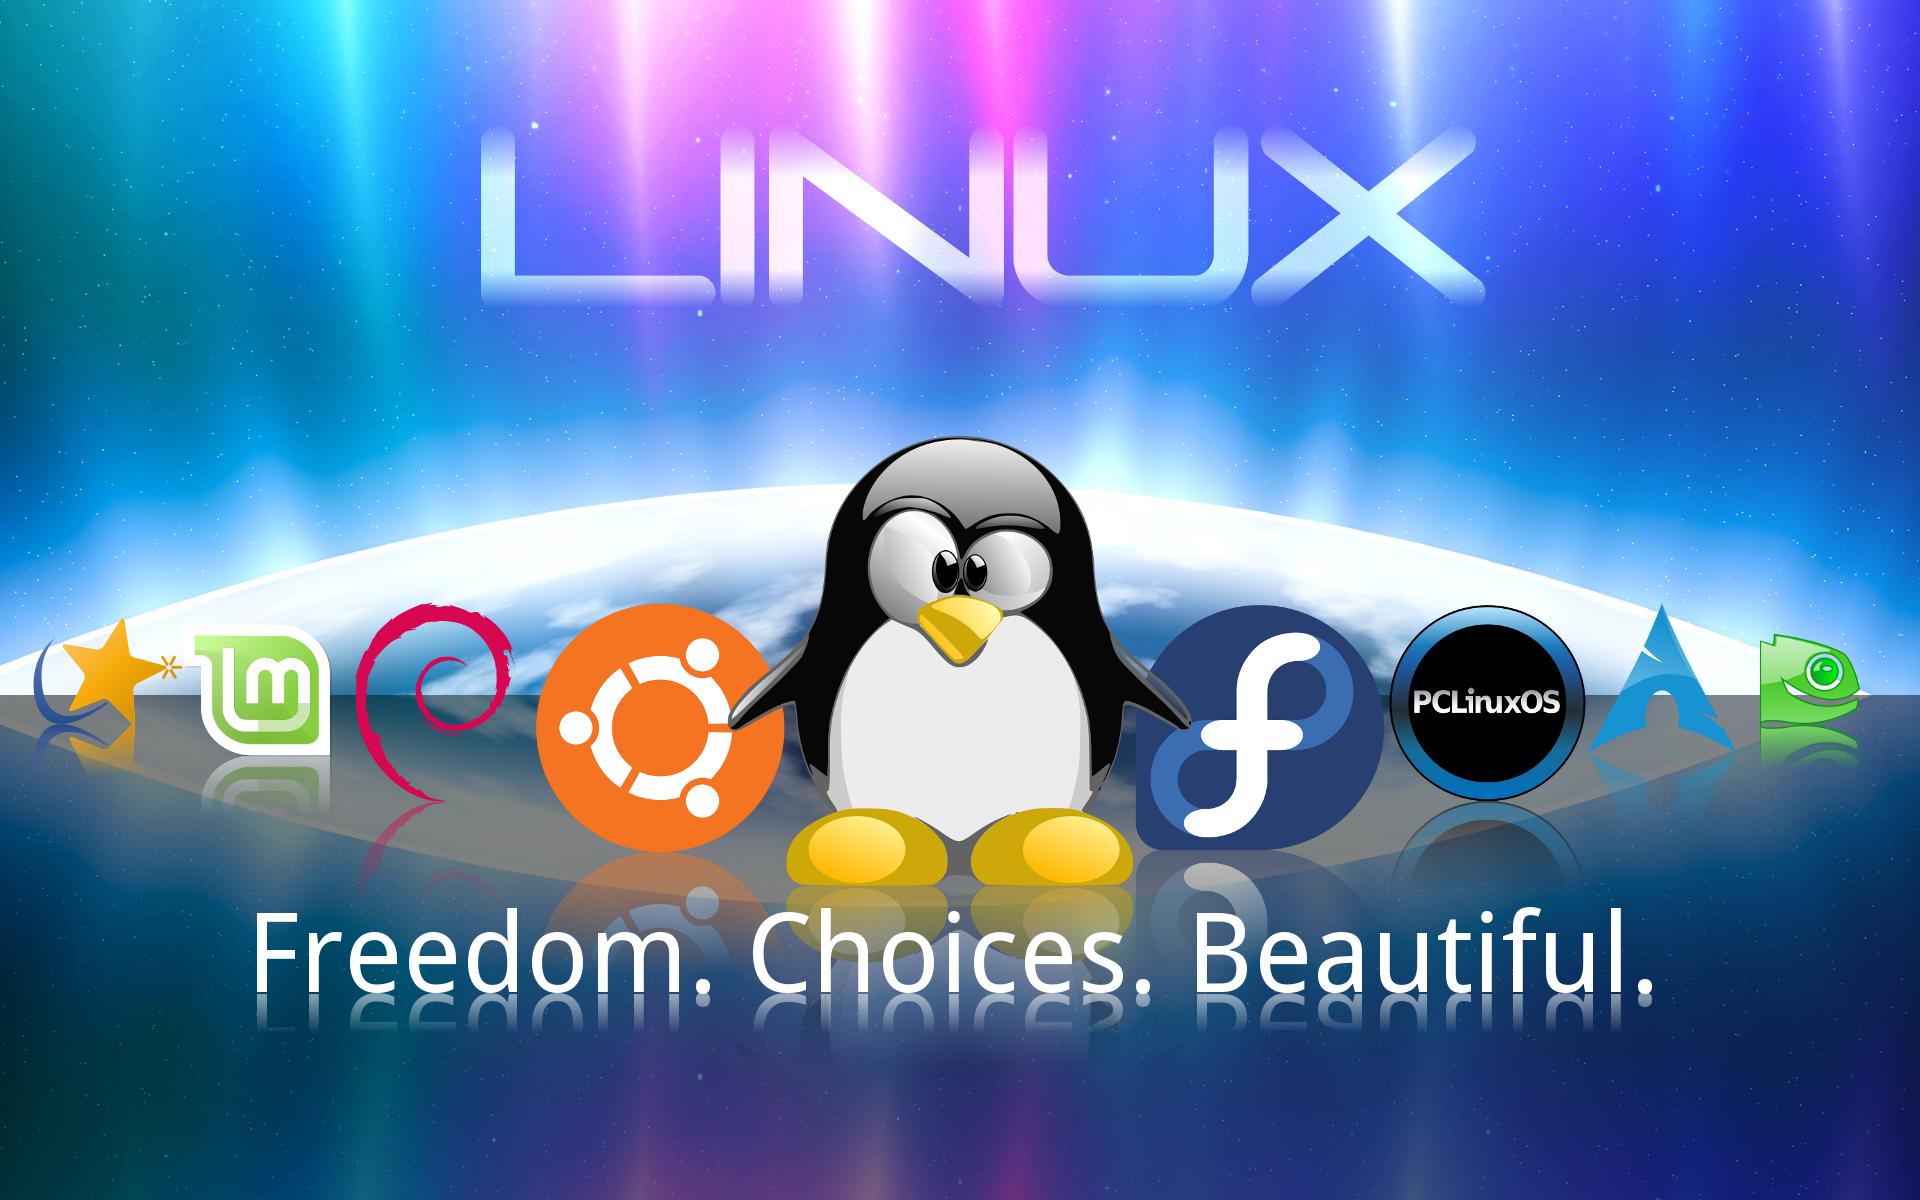 free linux wallpaper widescreen 1920x1200 ImageBankbiz 1920x1200